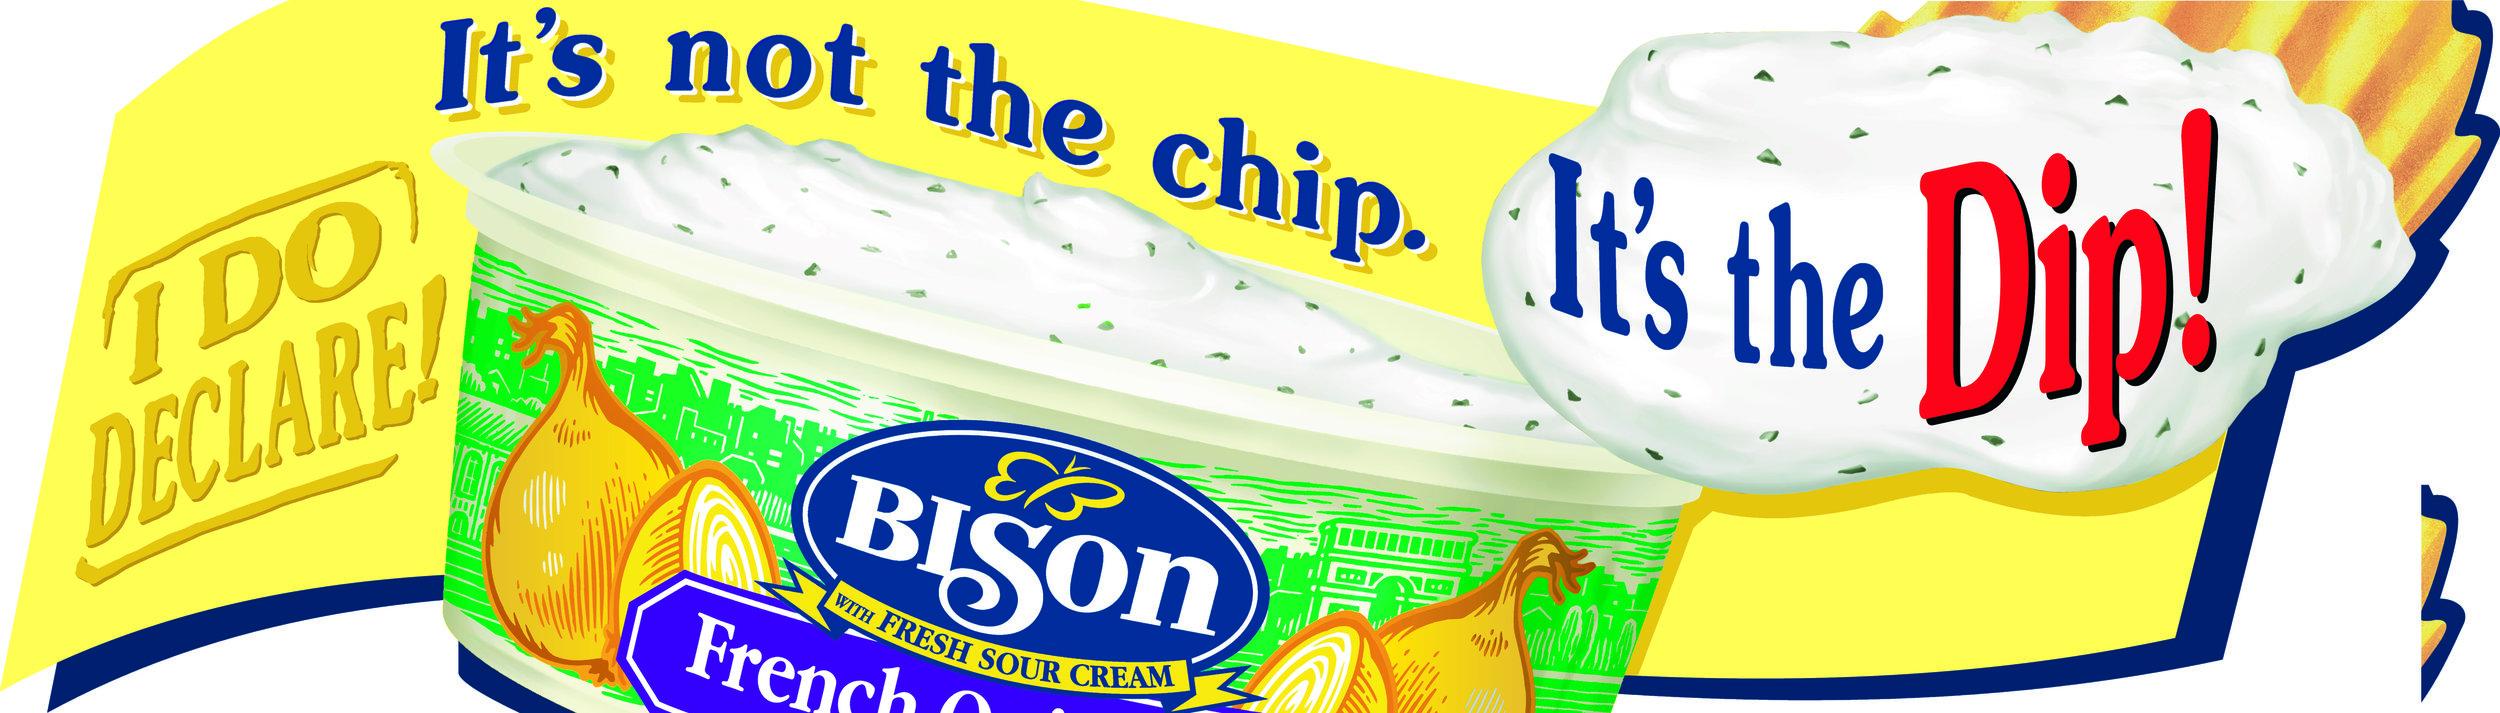 Bison Dip.jpg